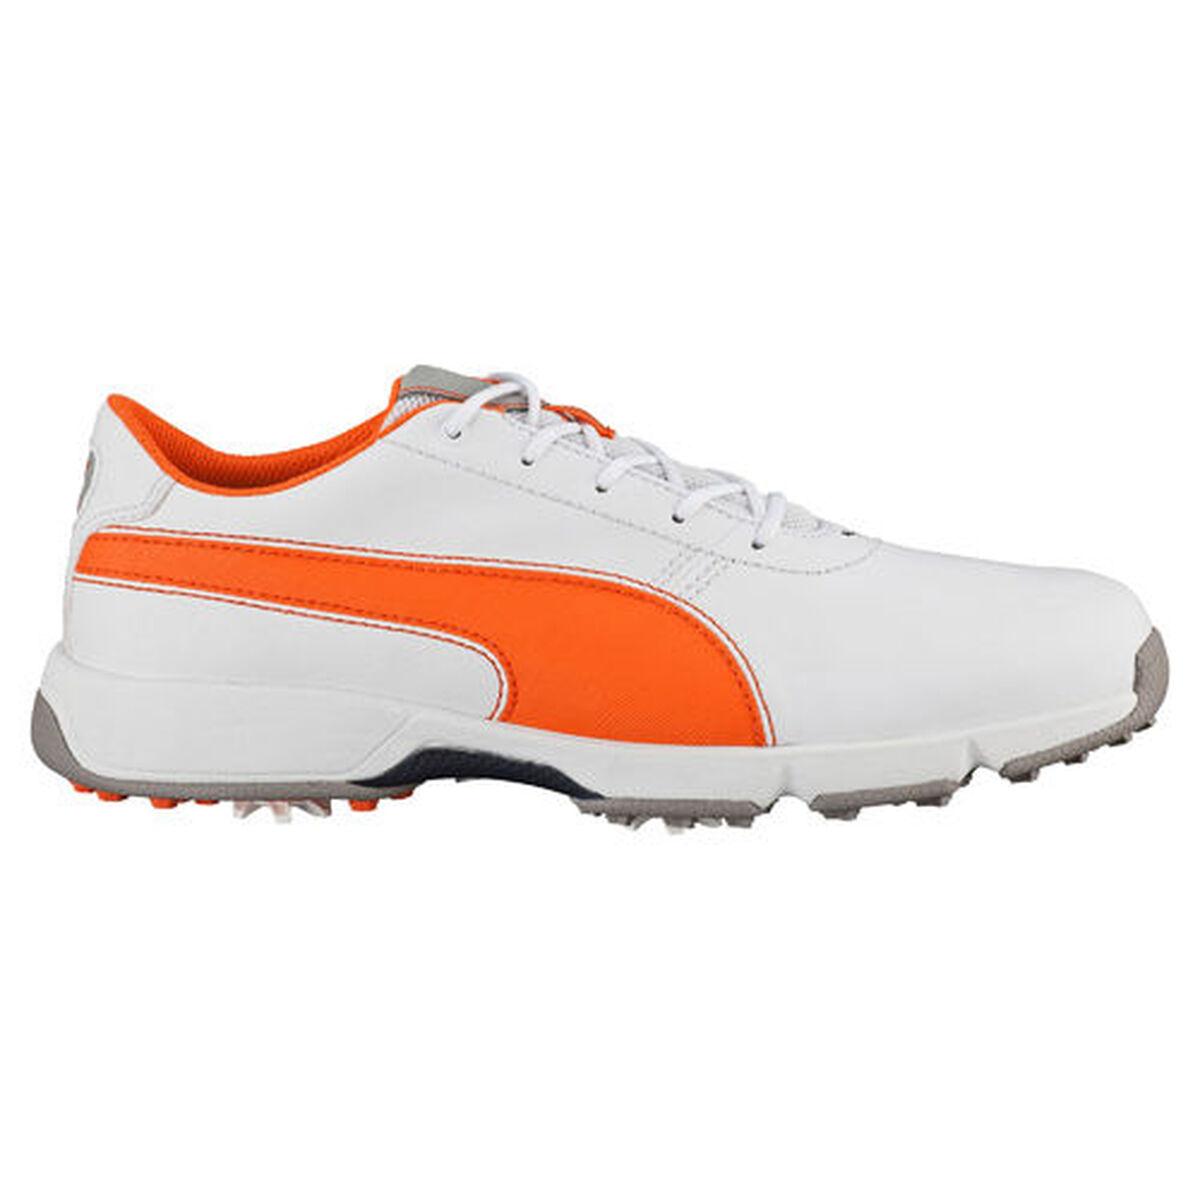 e63a29c10cd66d Images. PUMA Ignite Drive Men  39 s Golf Shoe - White Orange